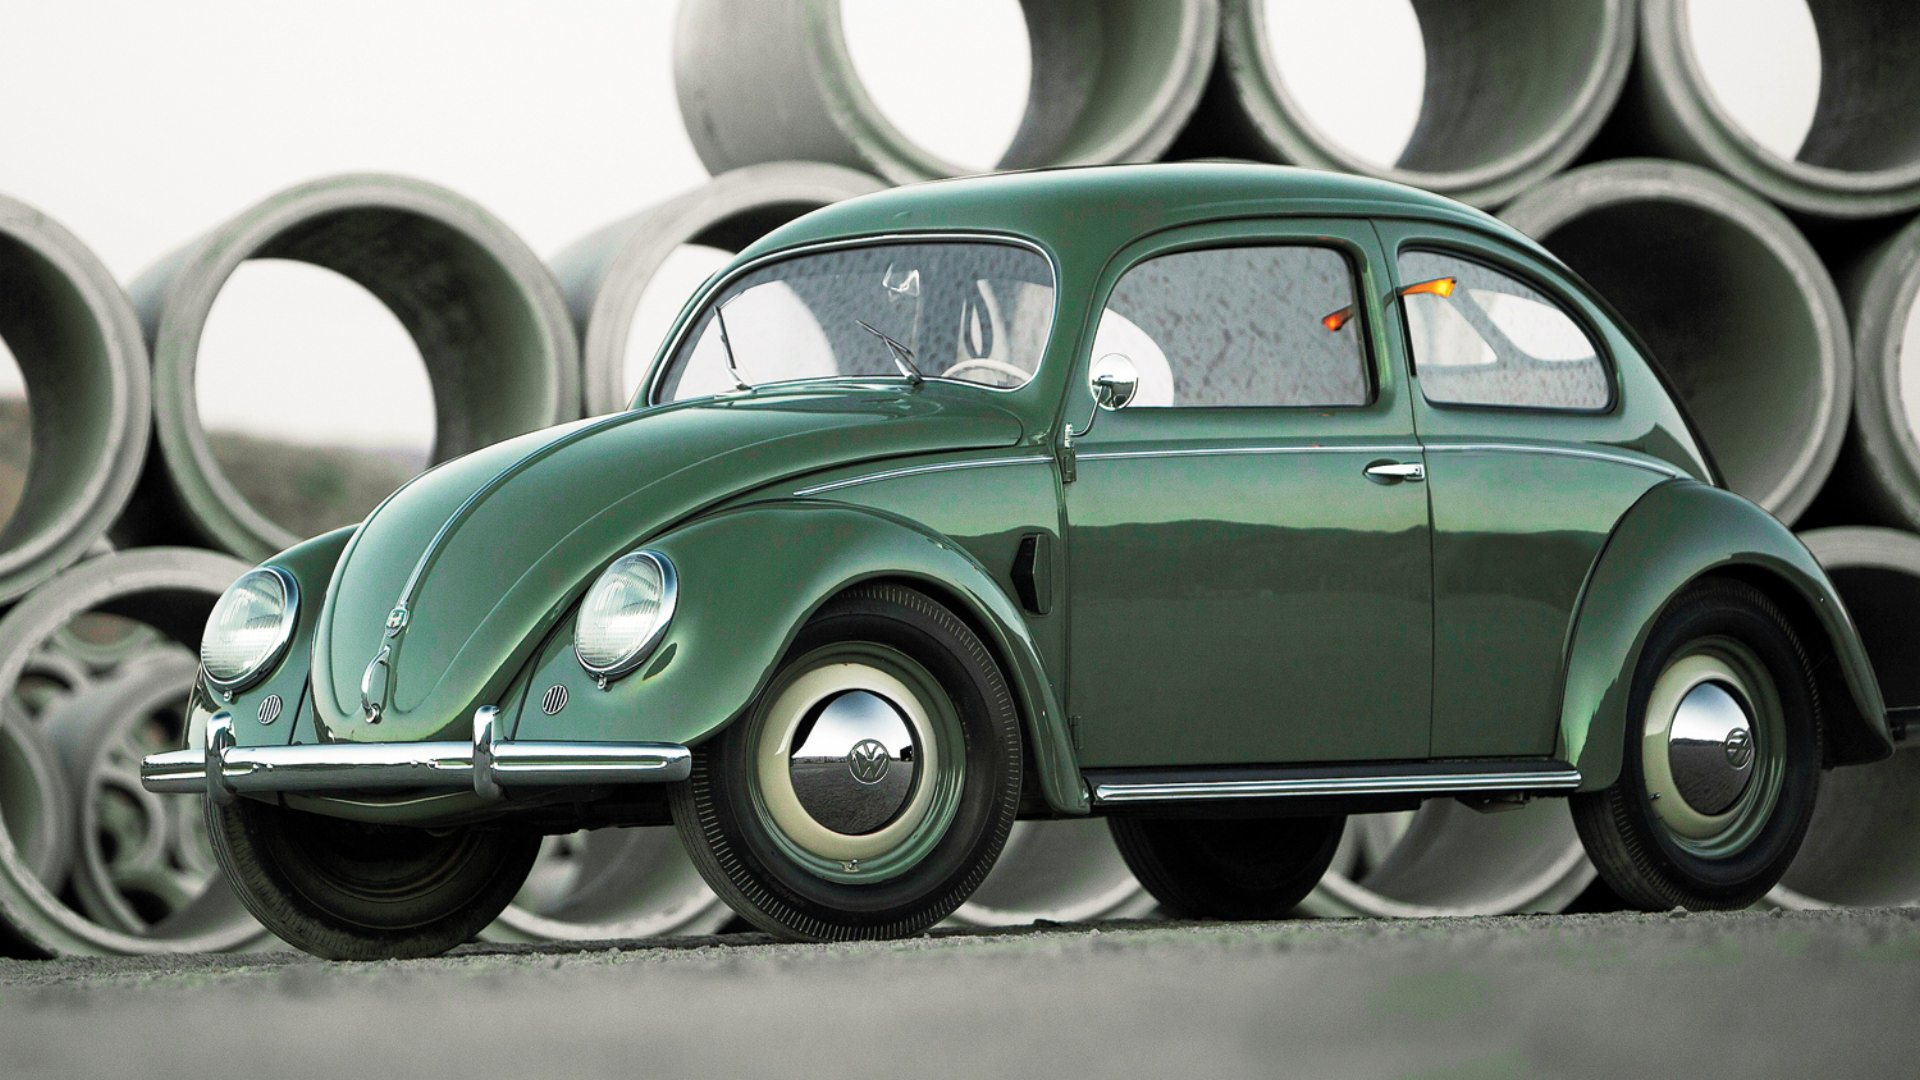 vw bug wiring diagram for dune buggy rj11 to rj45 volkswagen free hd wallpapers page 0 wallpaperlepi green beetle wallpaper photos